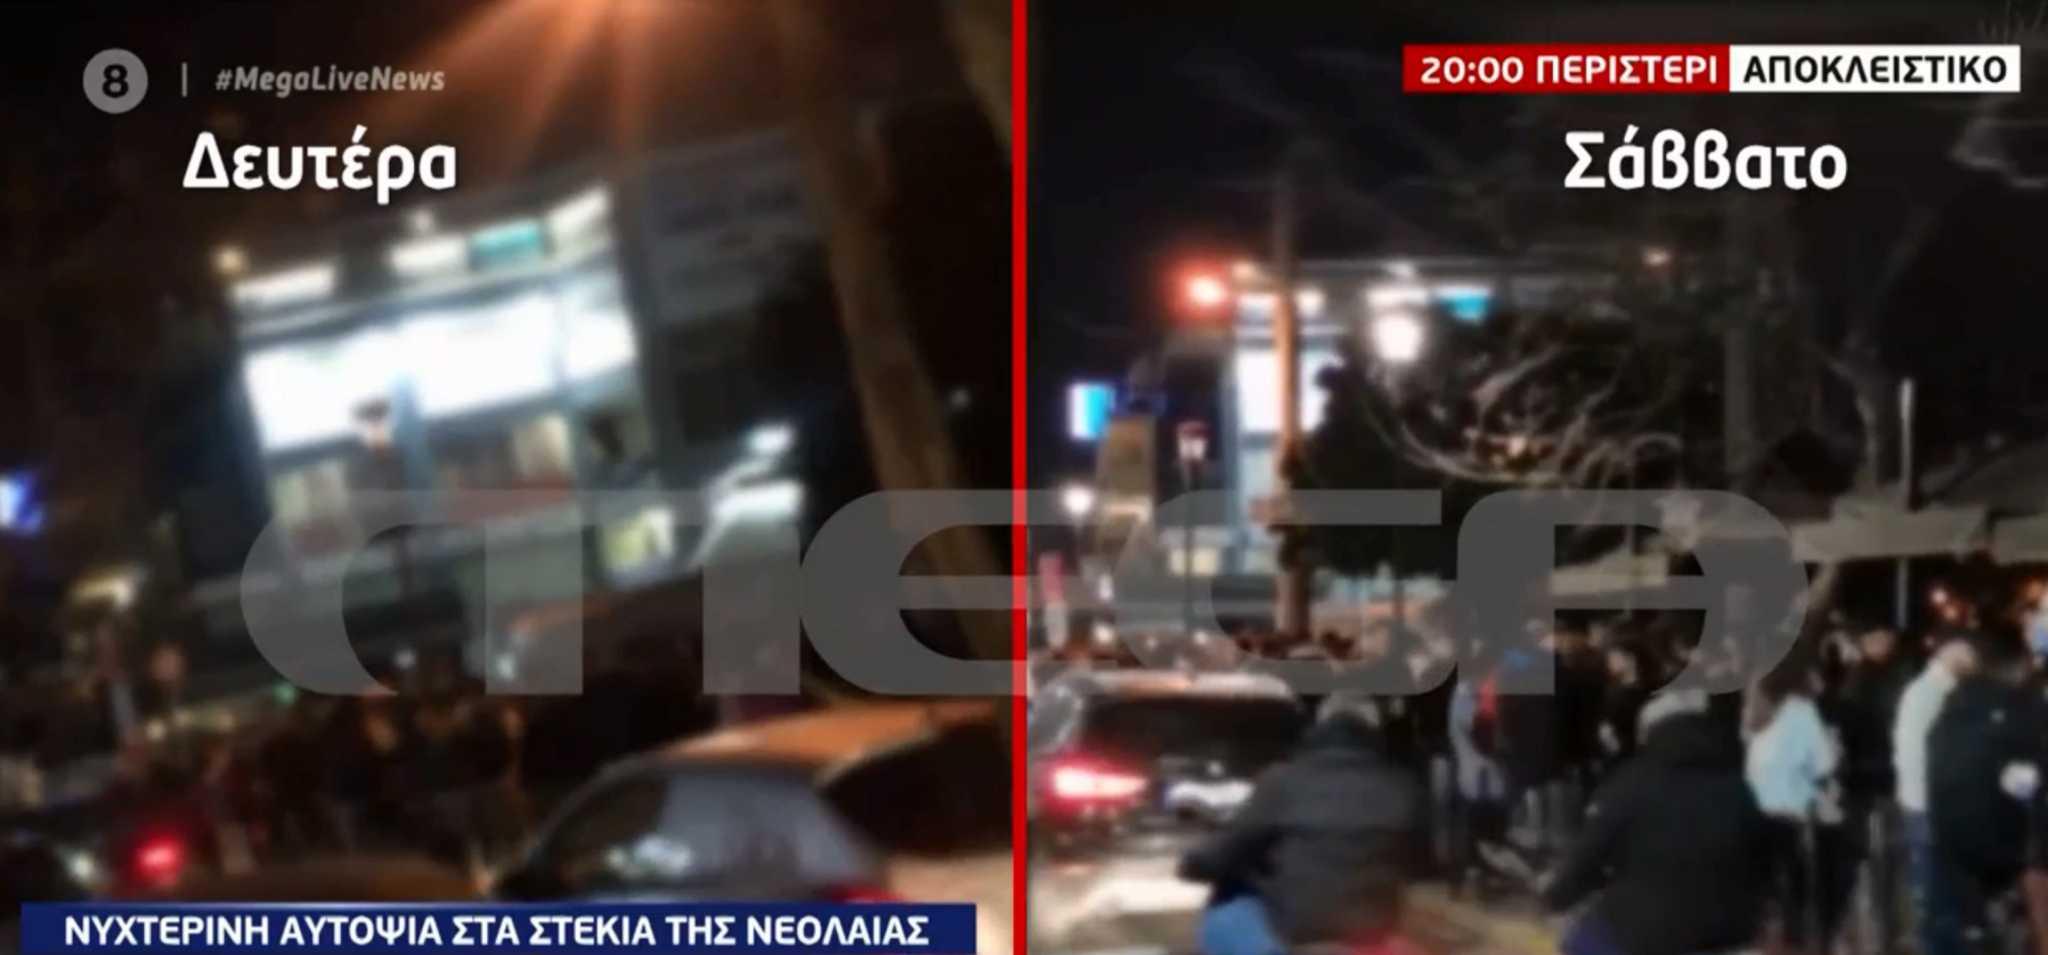 Lockdown: Δίχως τέλος τα υπαίθρια κορονοπάρτι σε δρόμους και πλατείες (video)